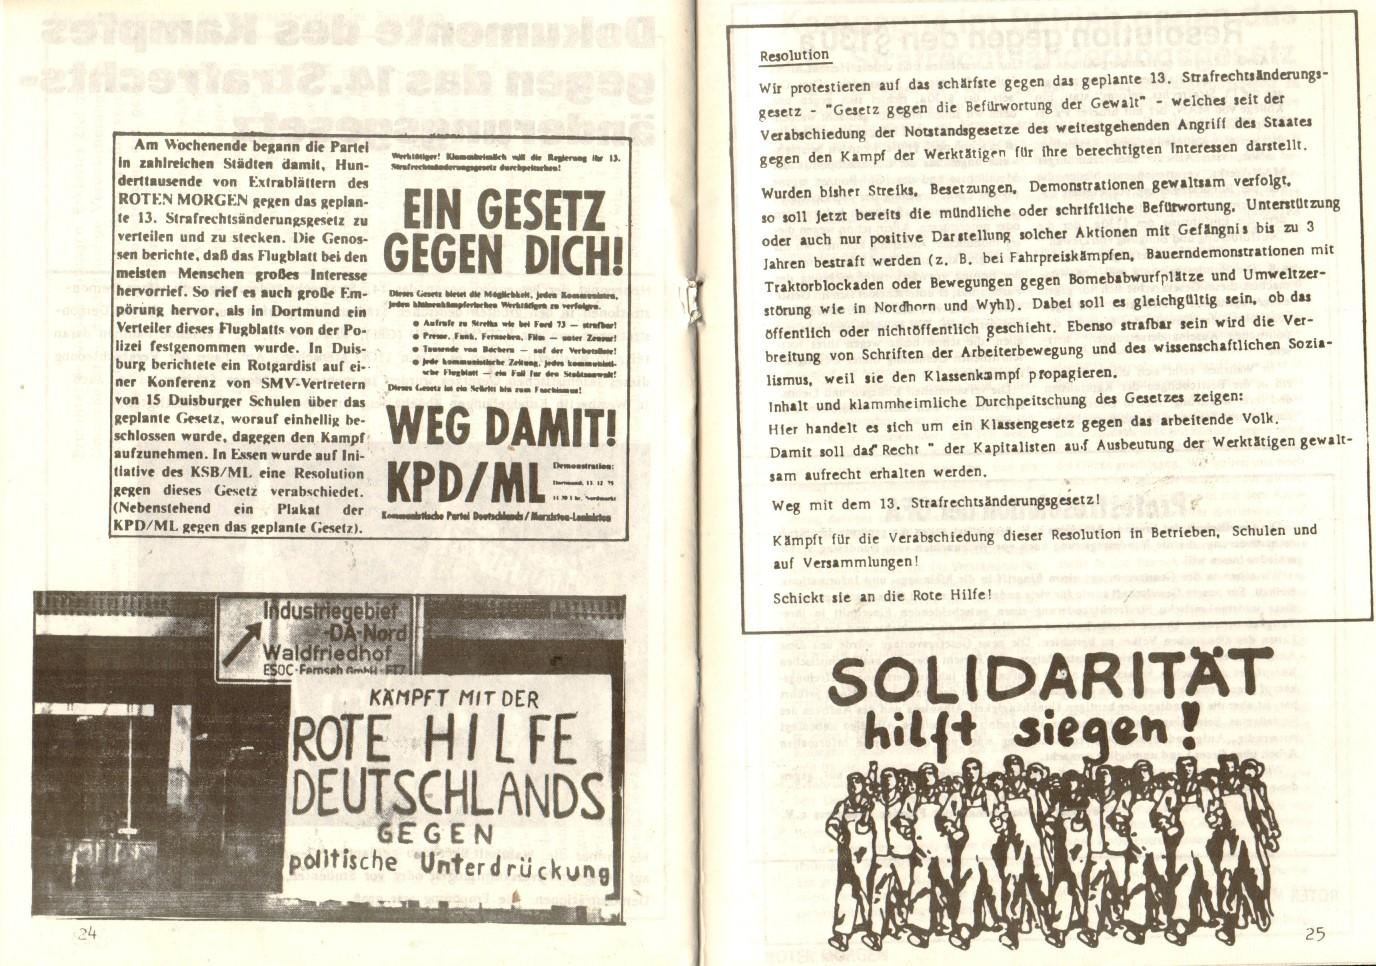 RHD_1976_Doku_Strafrechtsaenderungsgesetz_13